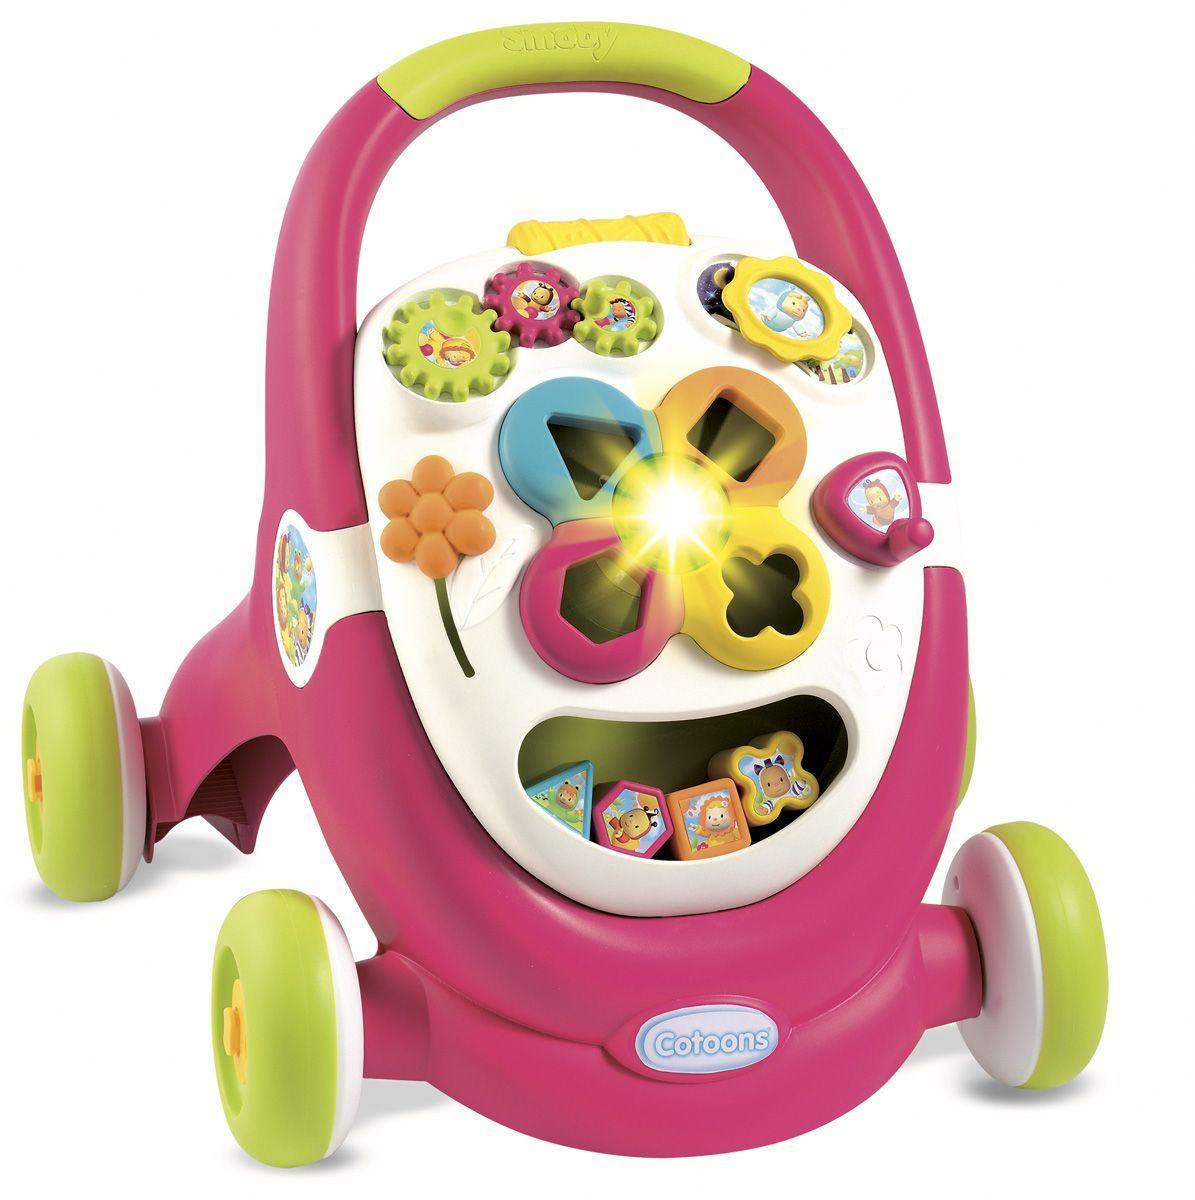 Smoby Ходунки-каталка цвет розовый -  Ходунки, прыгунки, качалки